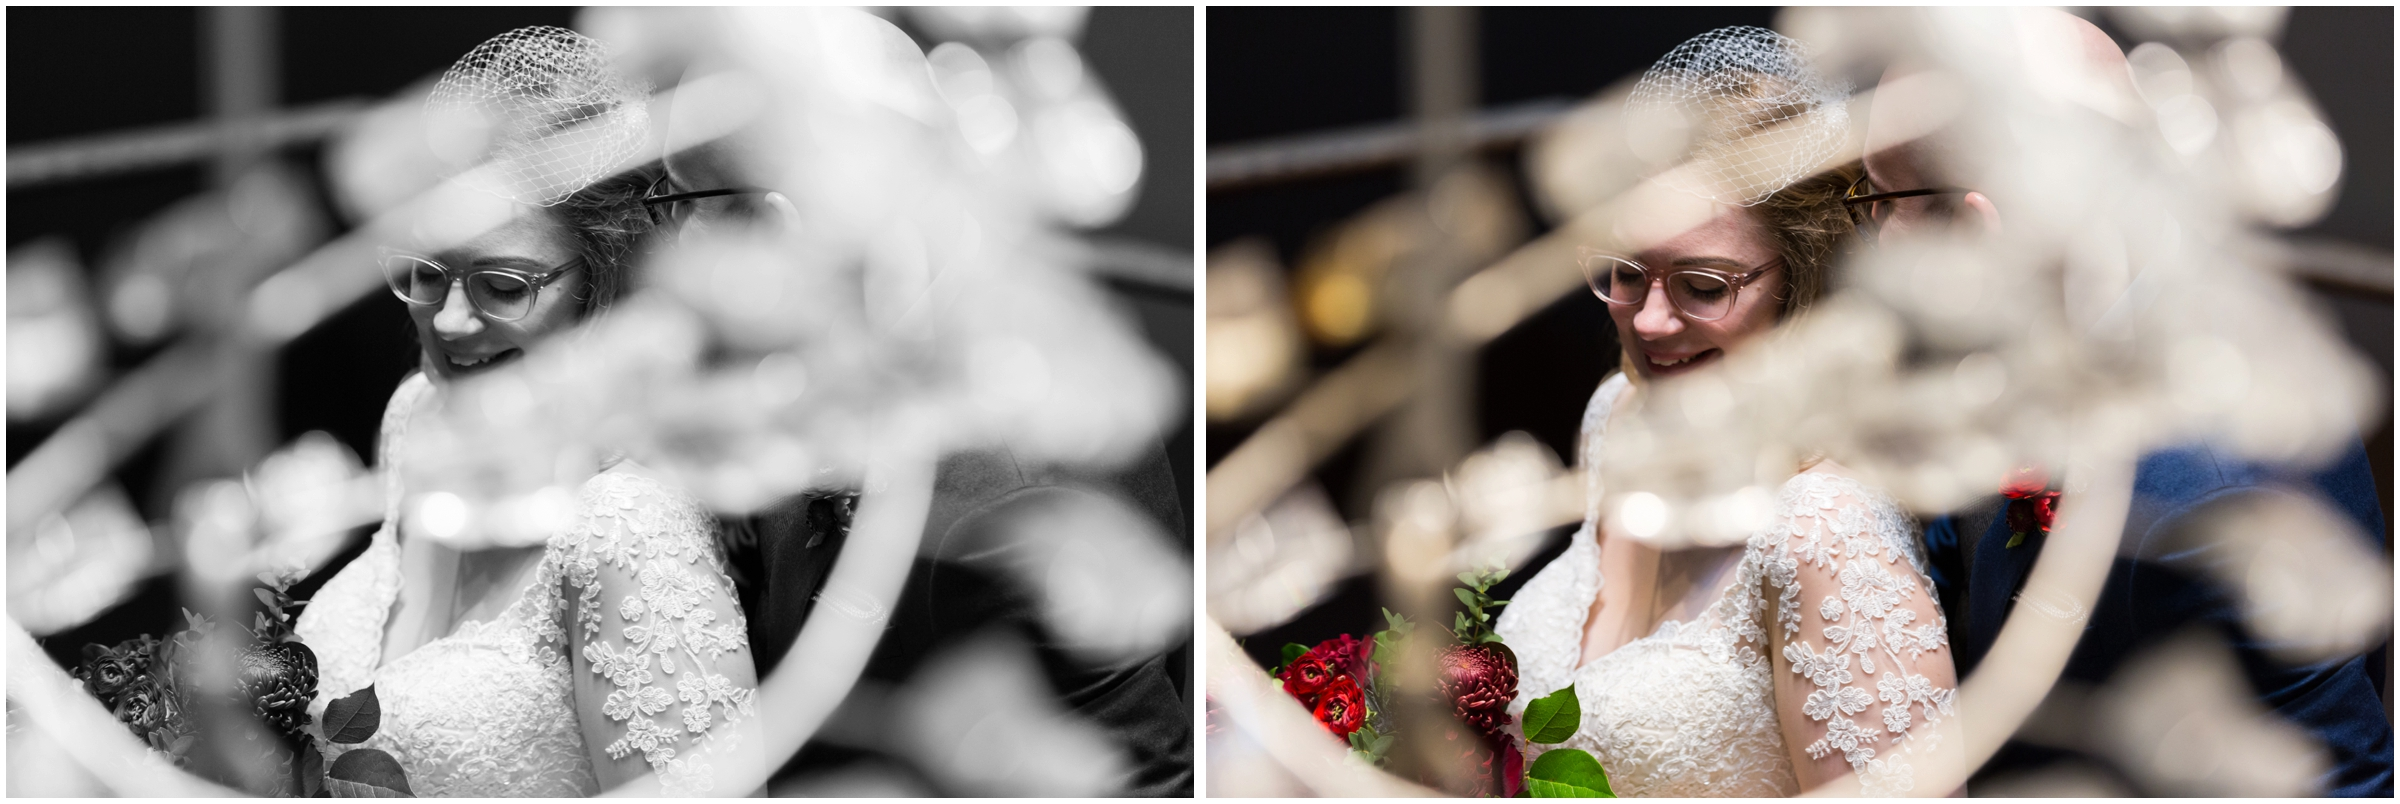 Ottaw Wedding Allison Andrew - (Selena Phillips-Boyle)_0040.jpg